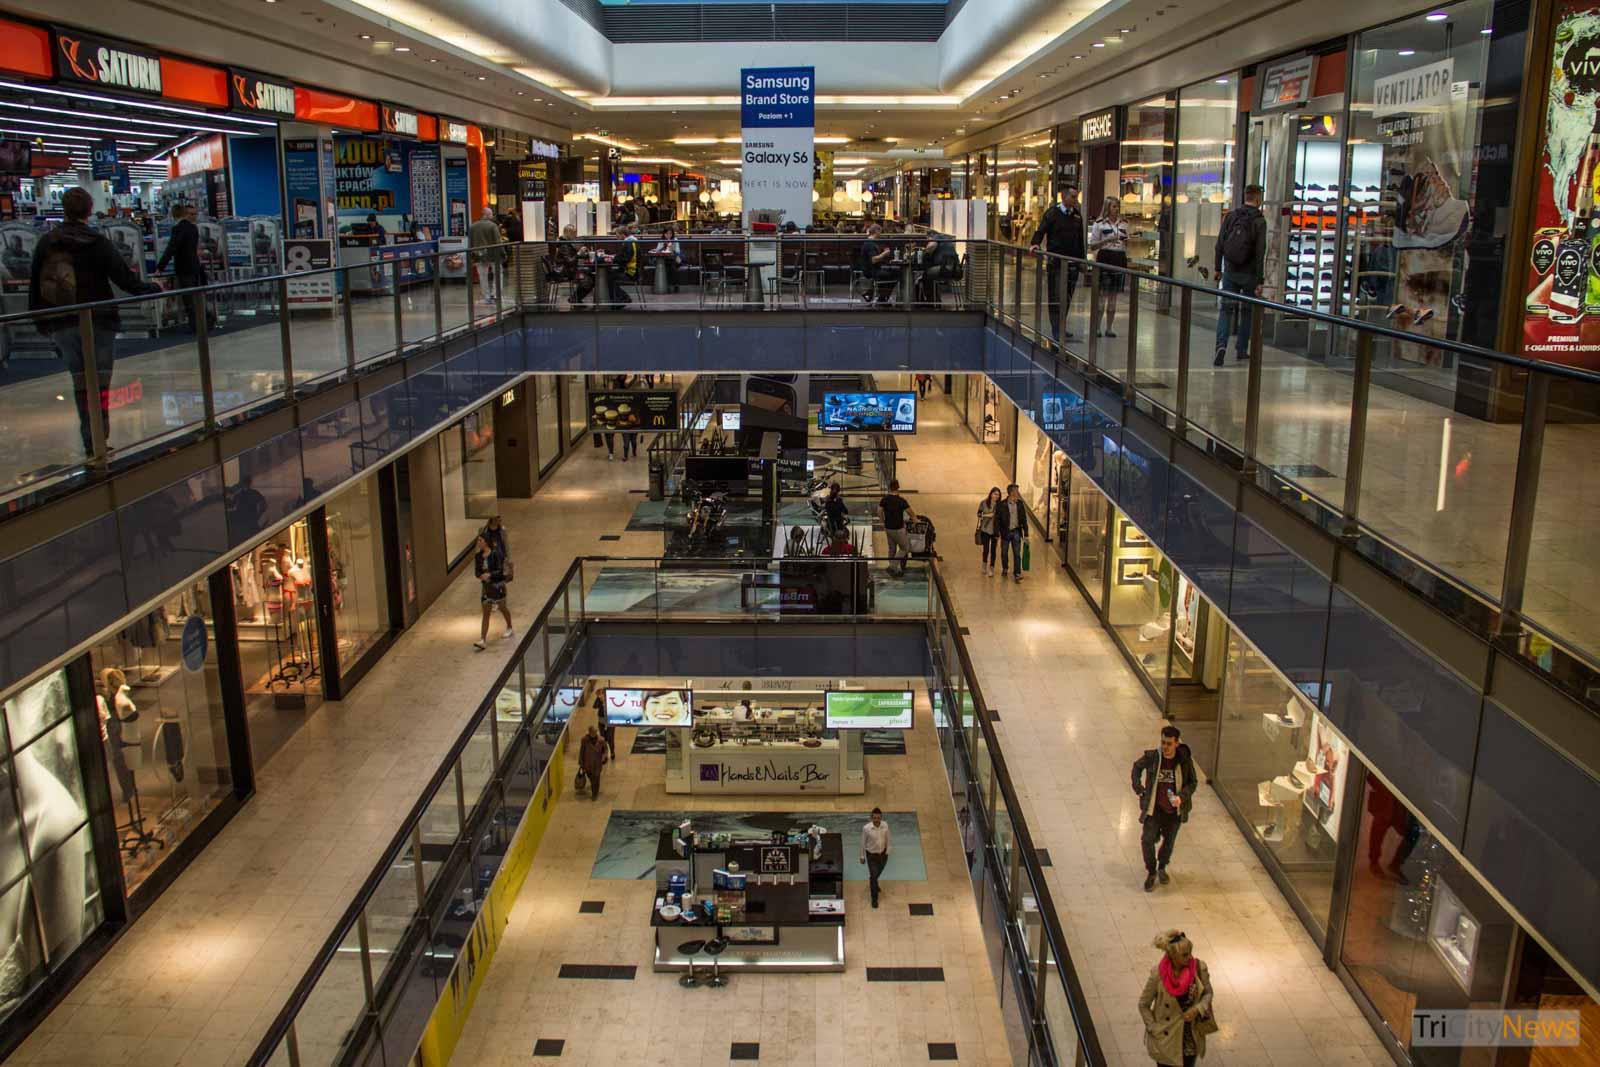 Galeria Baltycka shopping Mall in Gdansk - Trade Ban in Poland, photo: Jakub Wozniak/Tricity News